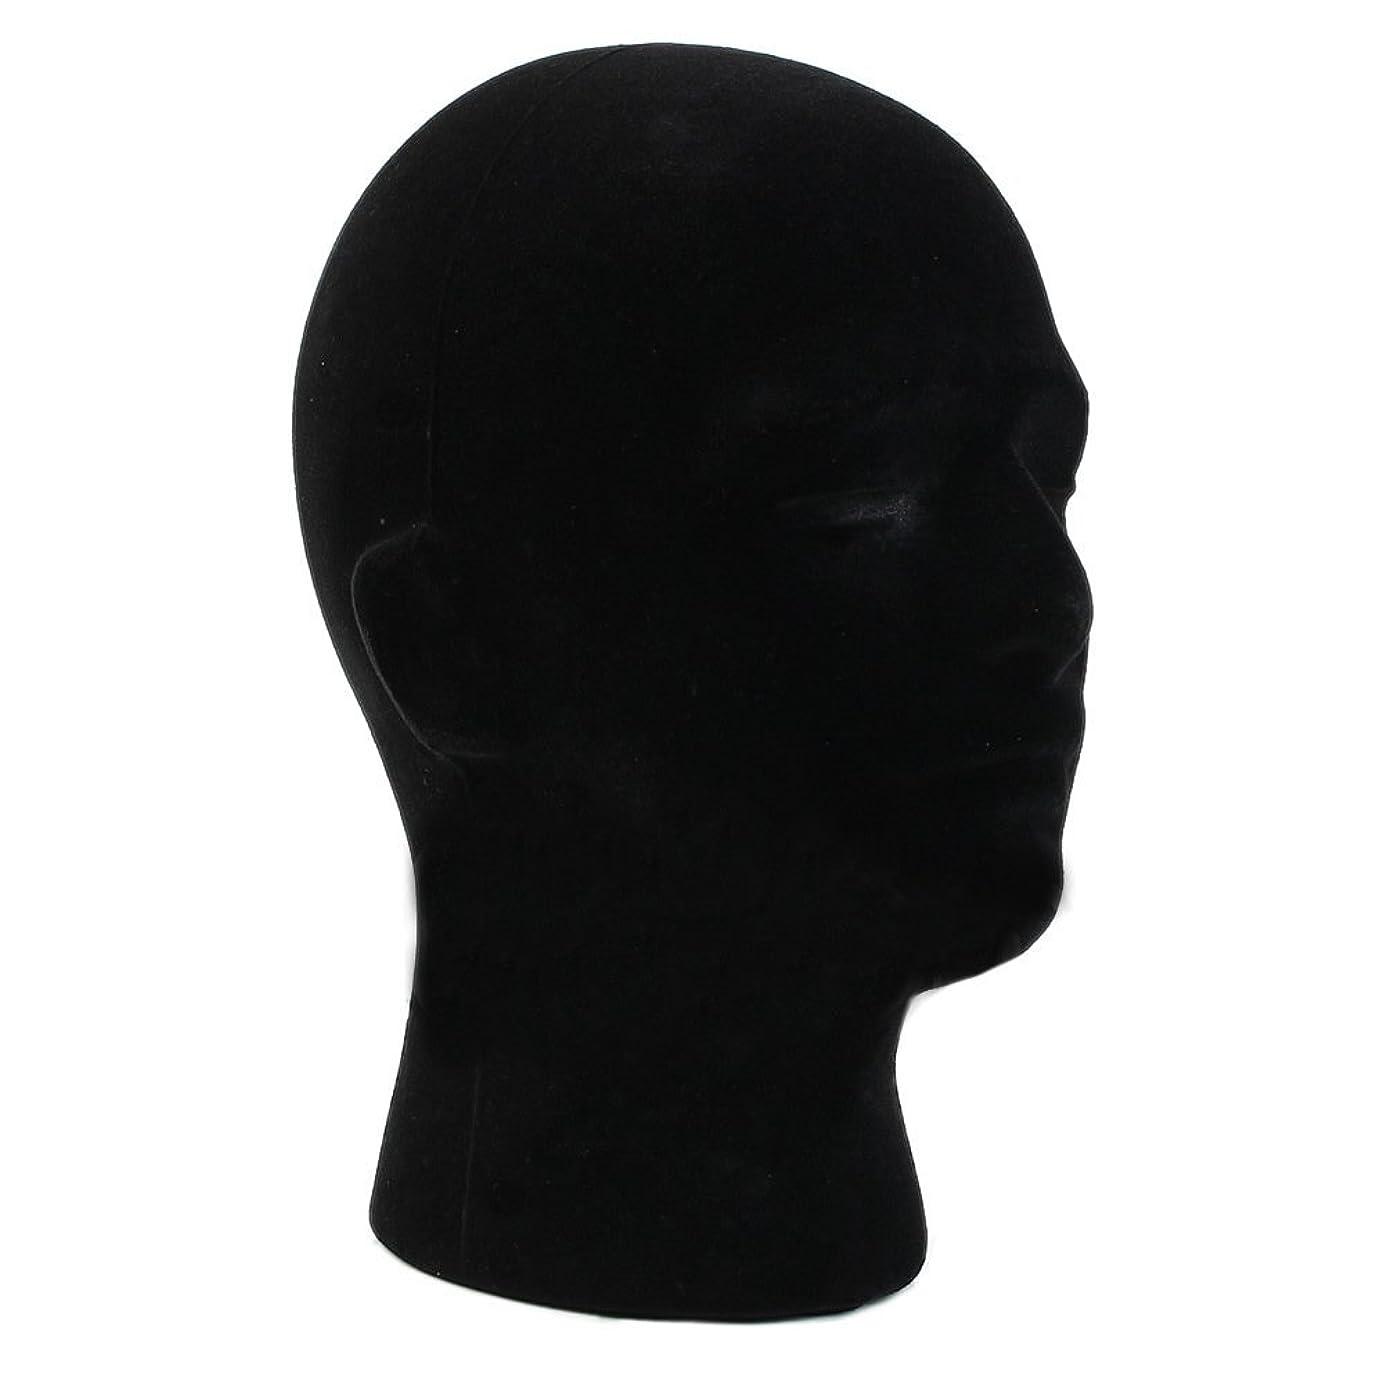 Mannequins - Male Styrofoam Foam Mannequin Manikin Head Model Wigs Glasses Cap Display Stand Black - Debra Dental Pins Styro Clamp Photography Hair Make Skin Bald Chair Dryer Model Brown Barbe